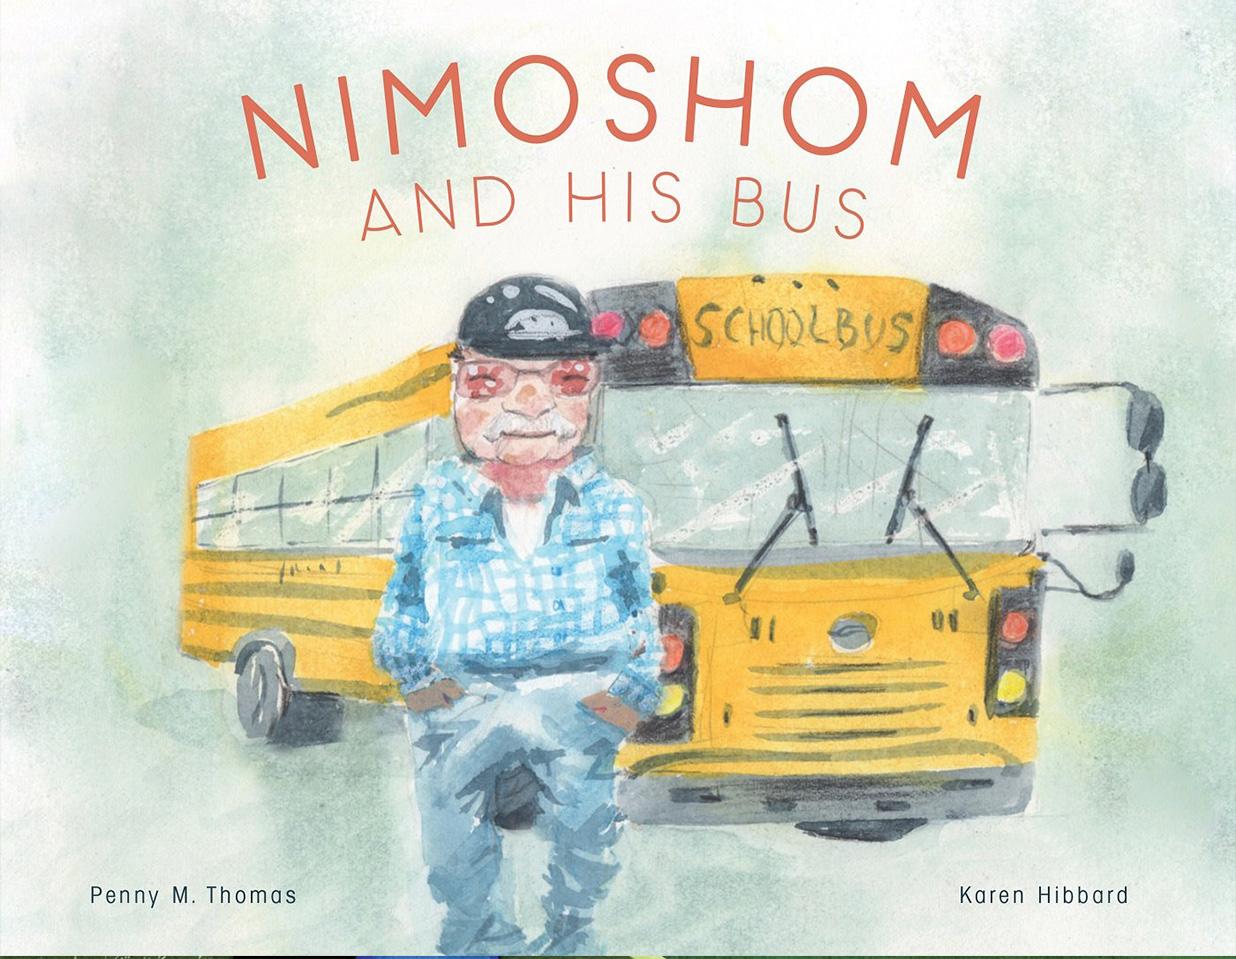 Nimoshom and His Bus by Penny M. Thomas